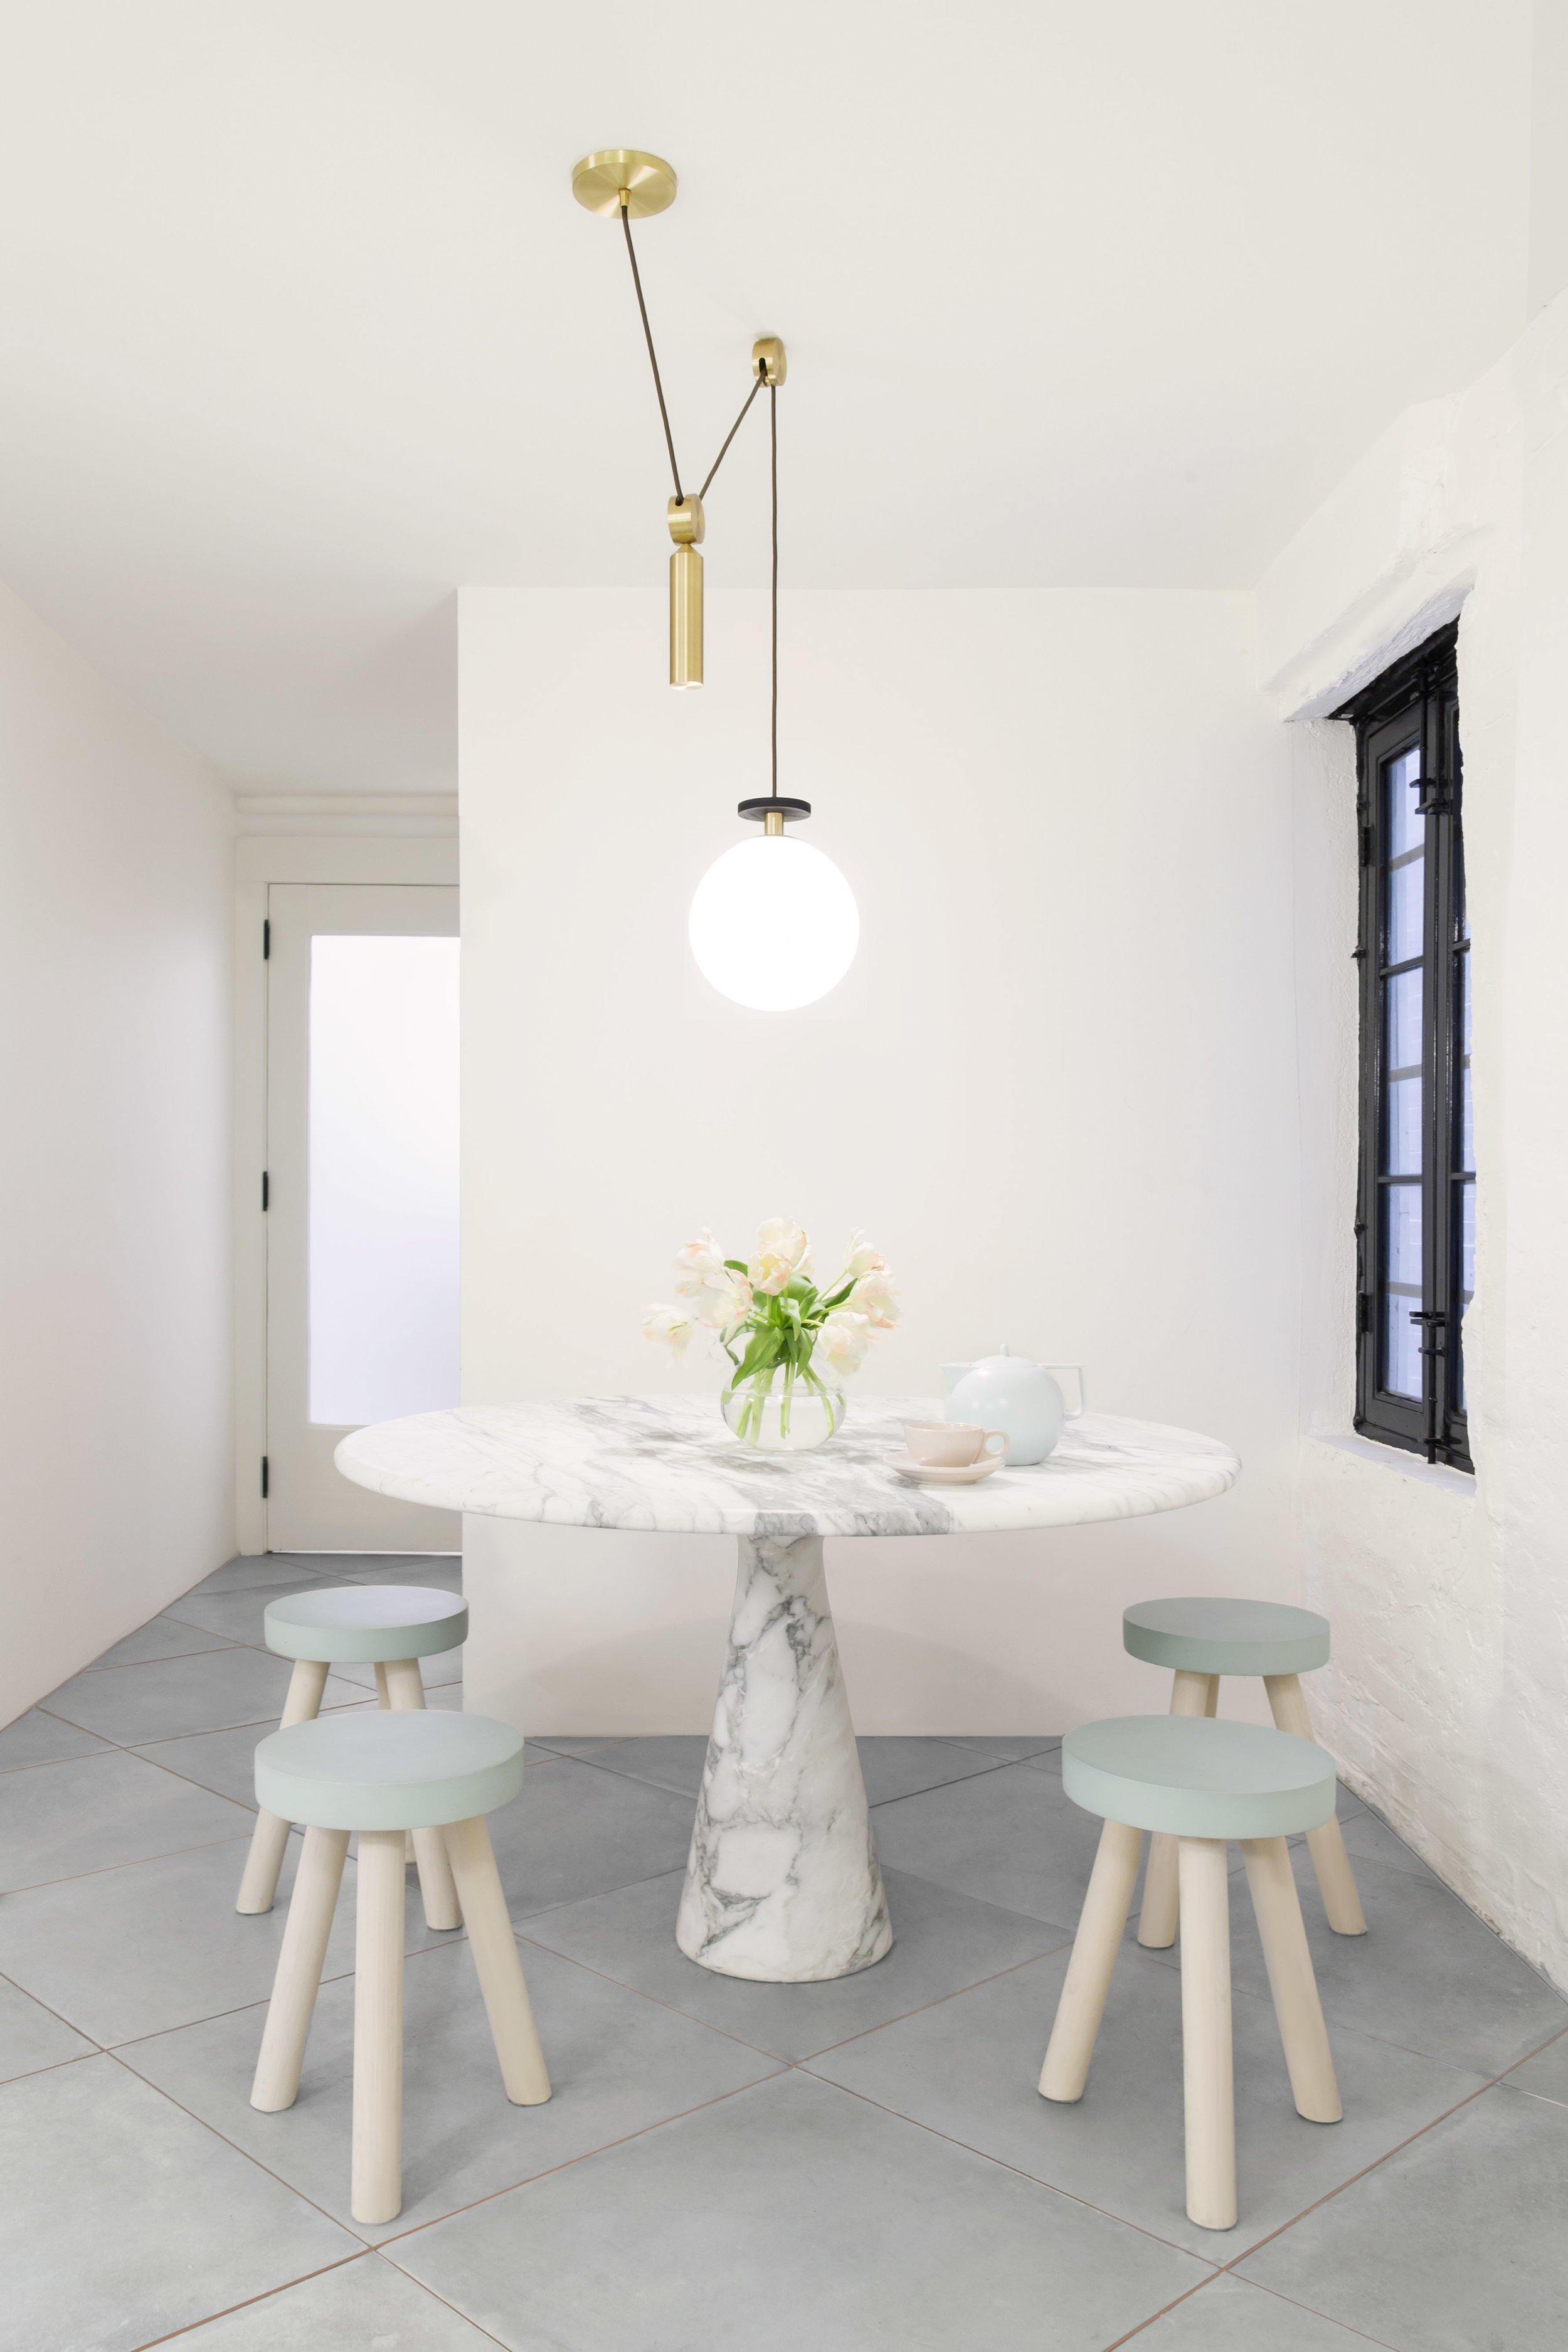 Interior by Studio DB, Photo by Matthew Williams